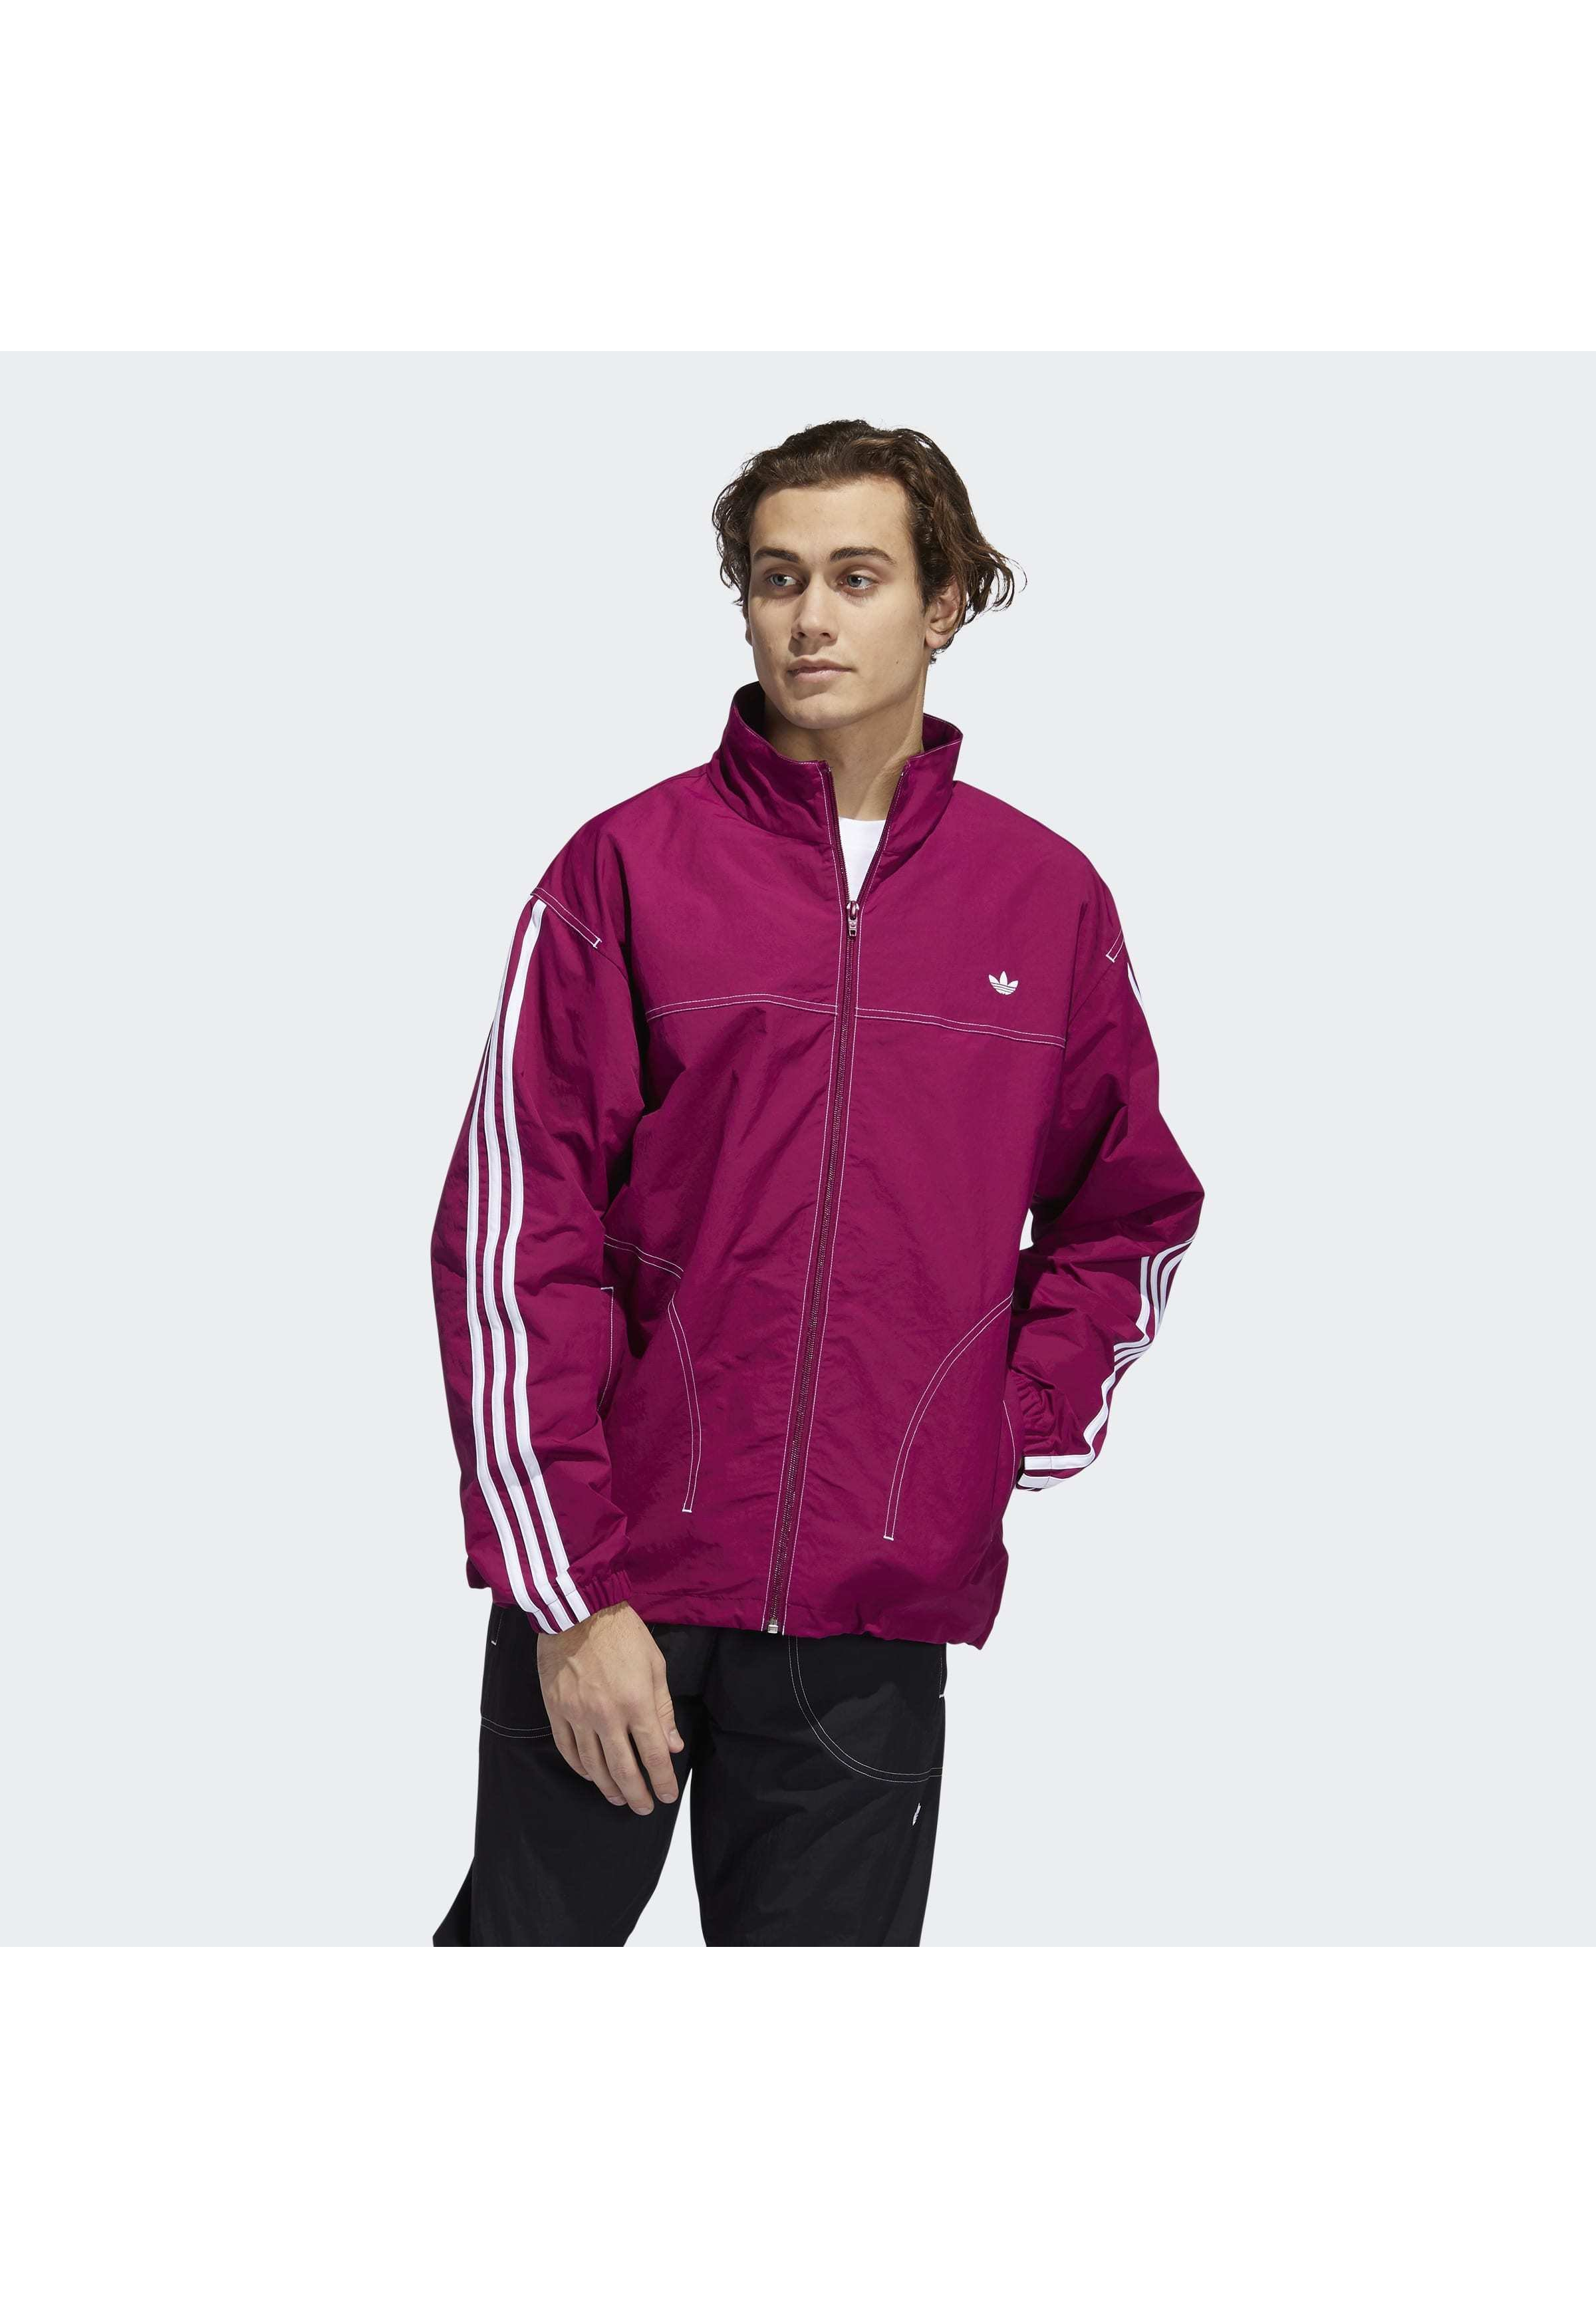 Adidas Originals Herren Magenta Trainingsjacke Top